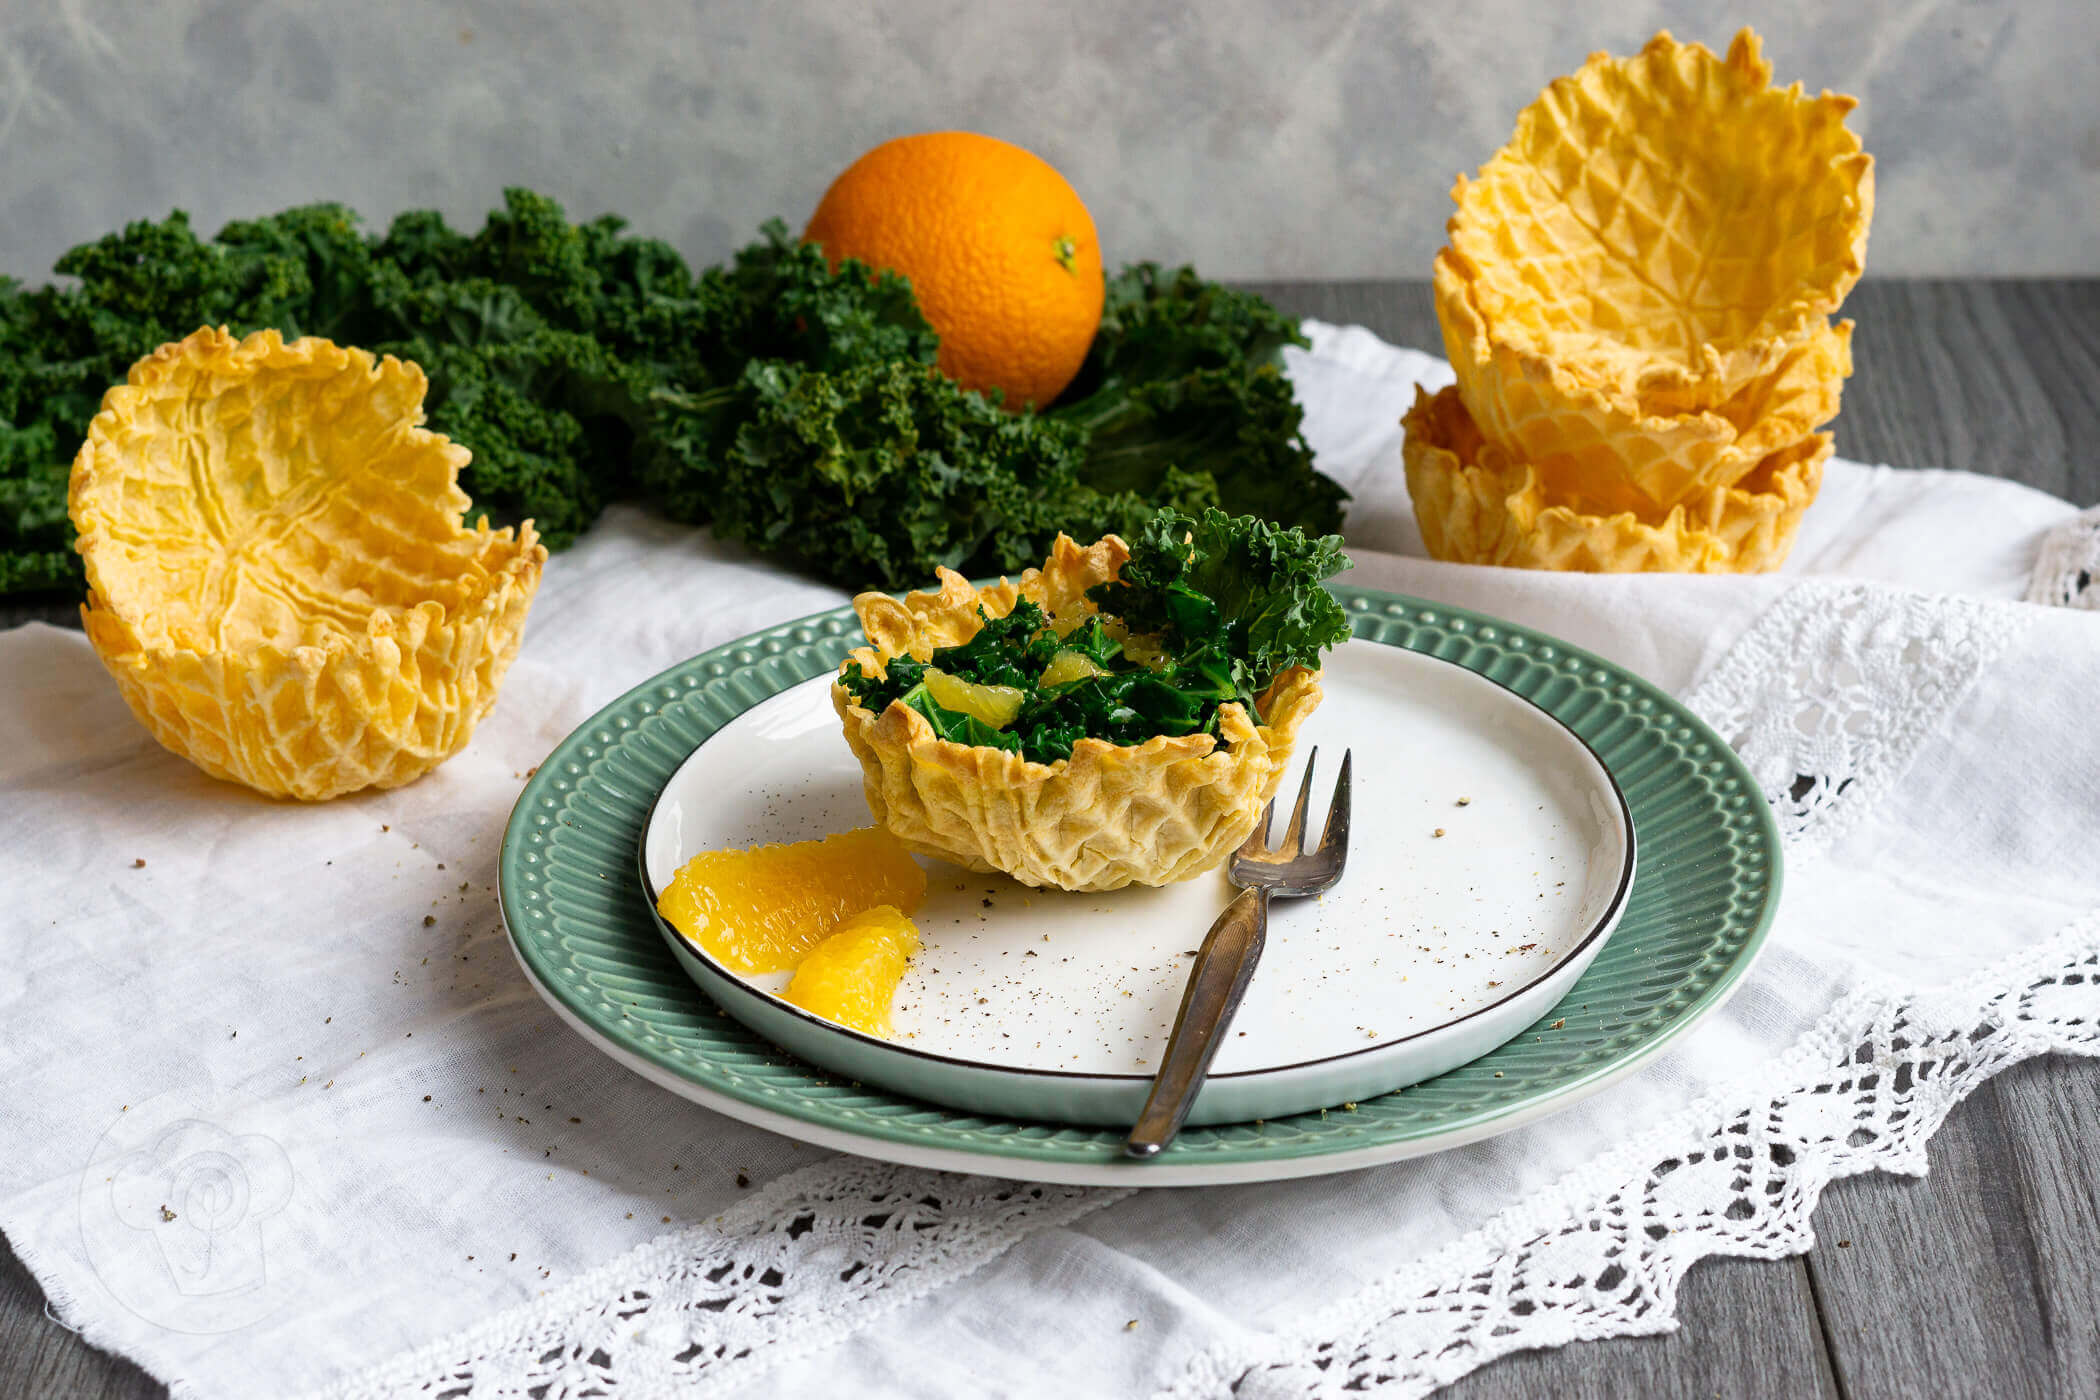 You are currently viewing Grünkohlsalat mit Orangen